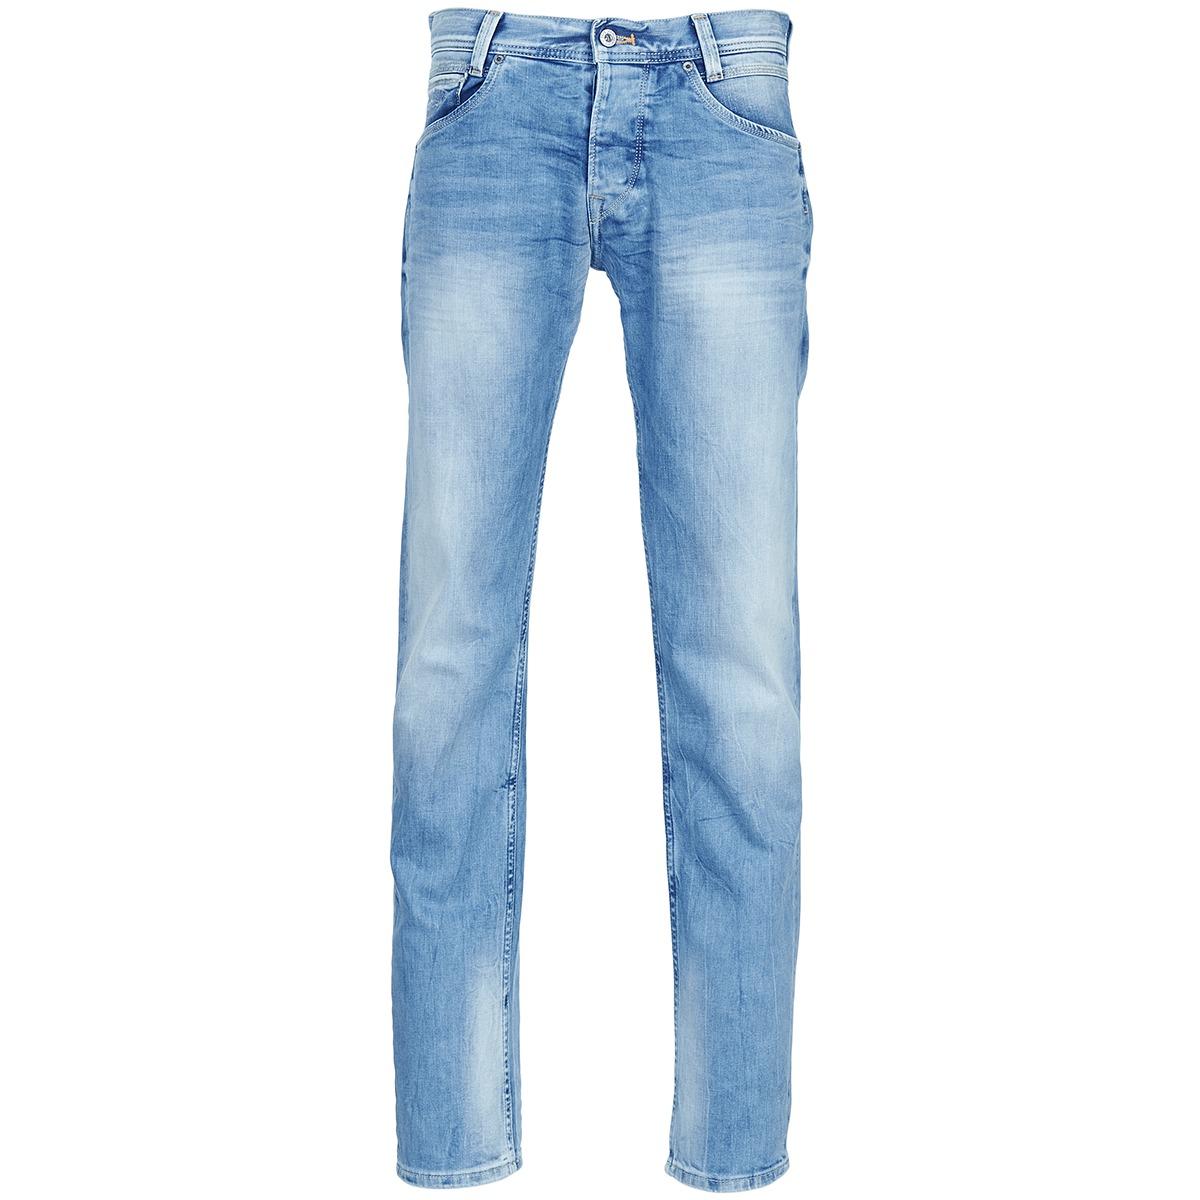 Pepe jeans SPIKE - Glami.hu 10713a23f6